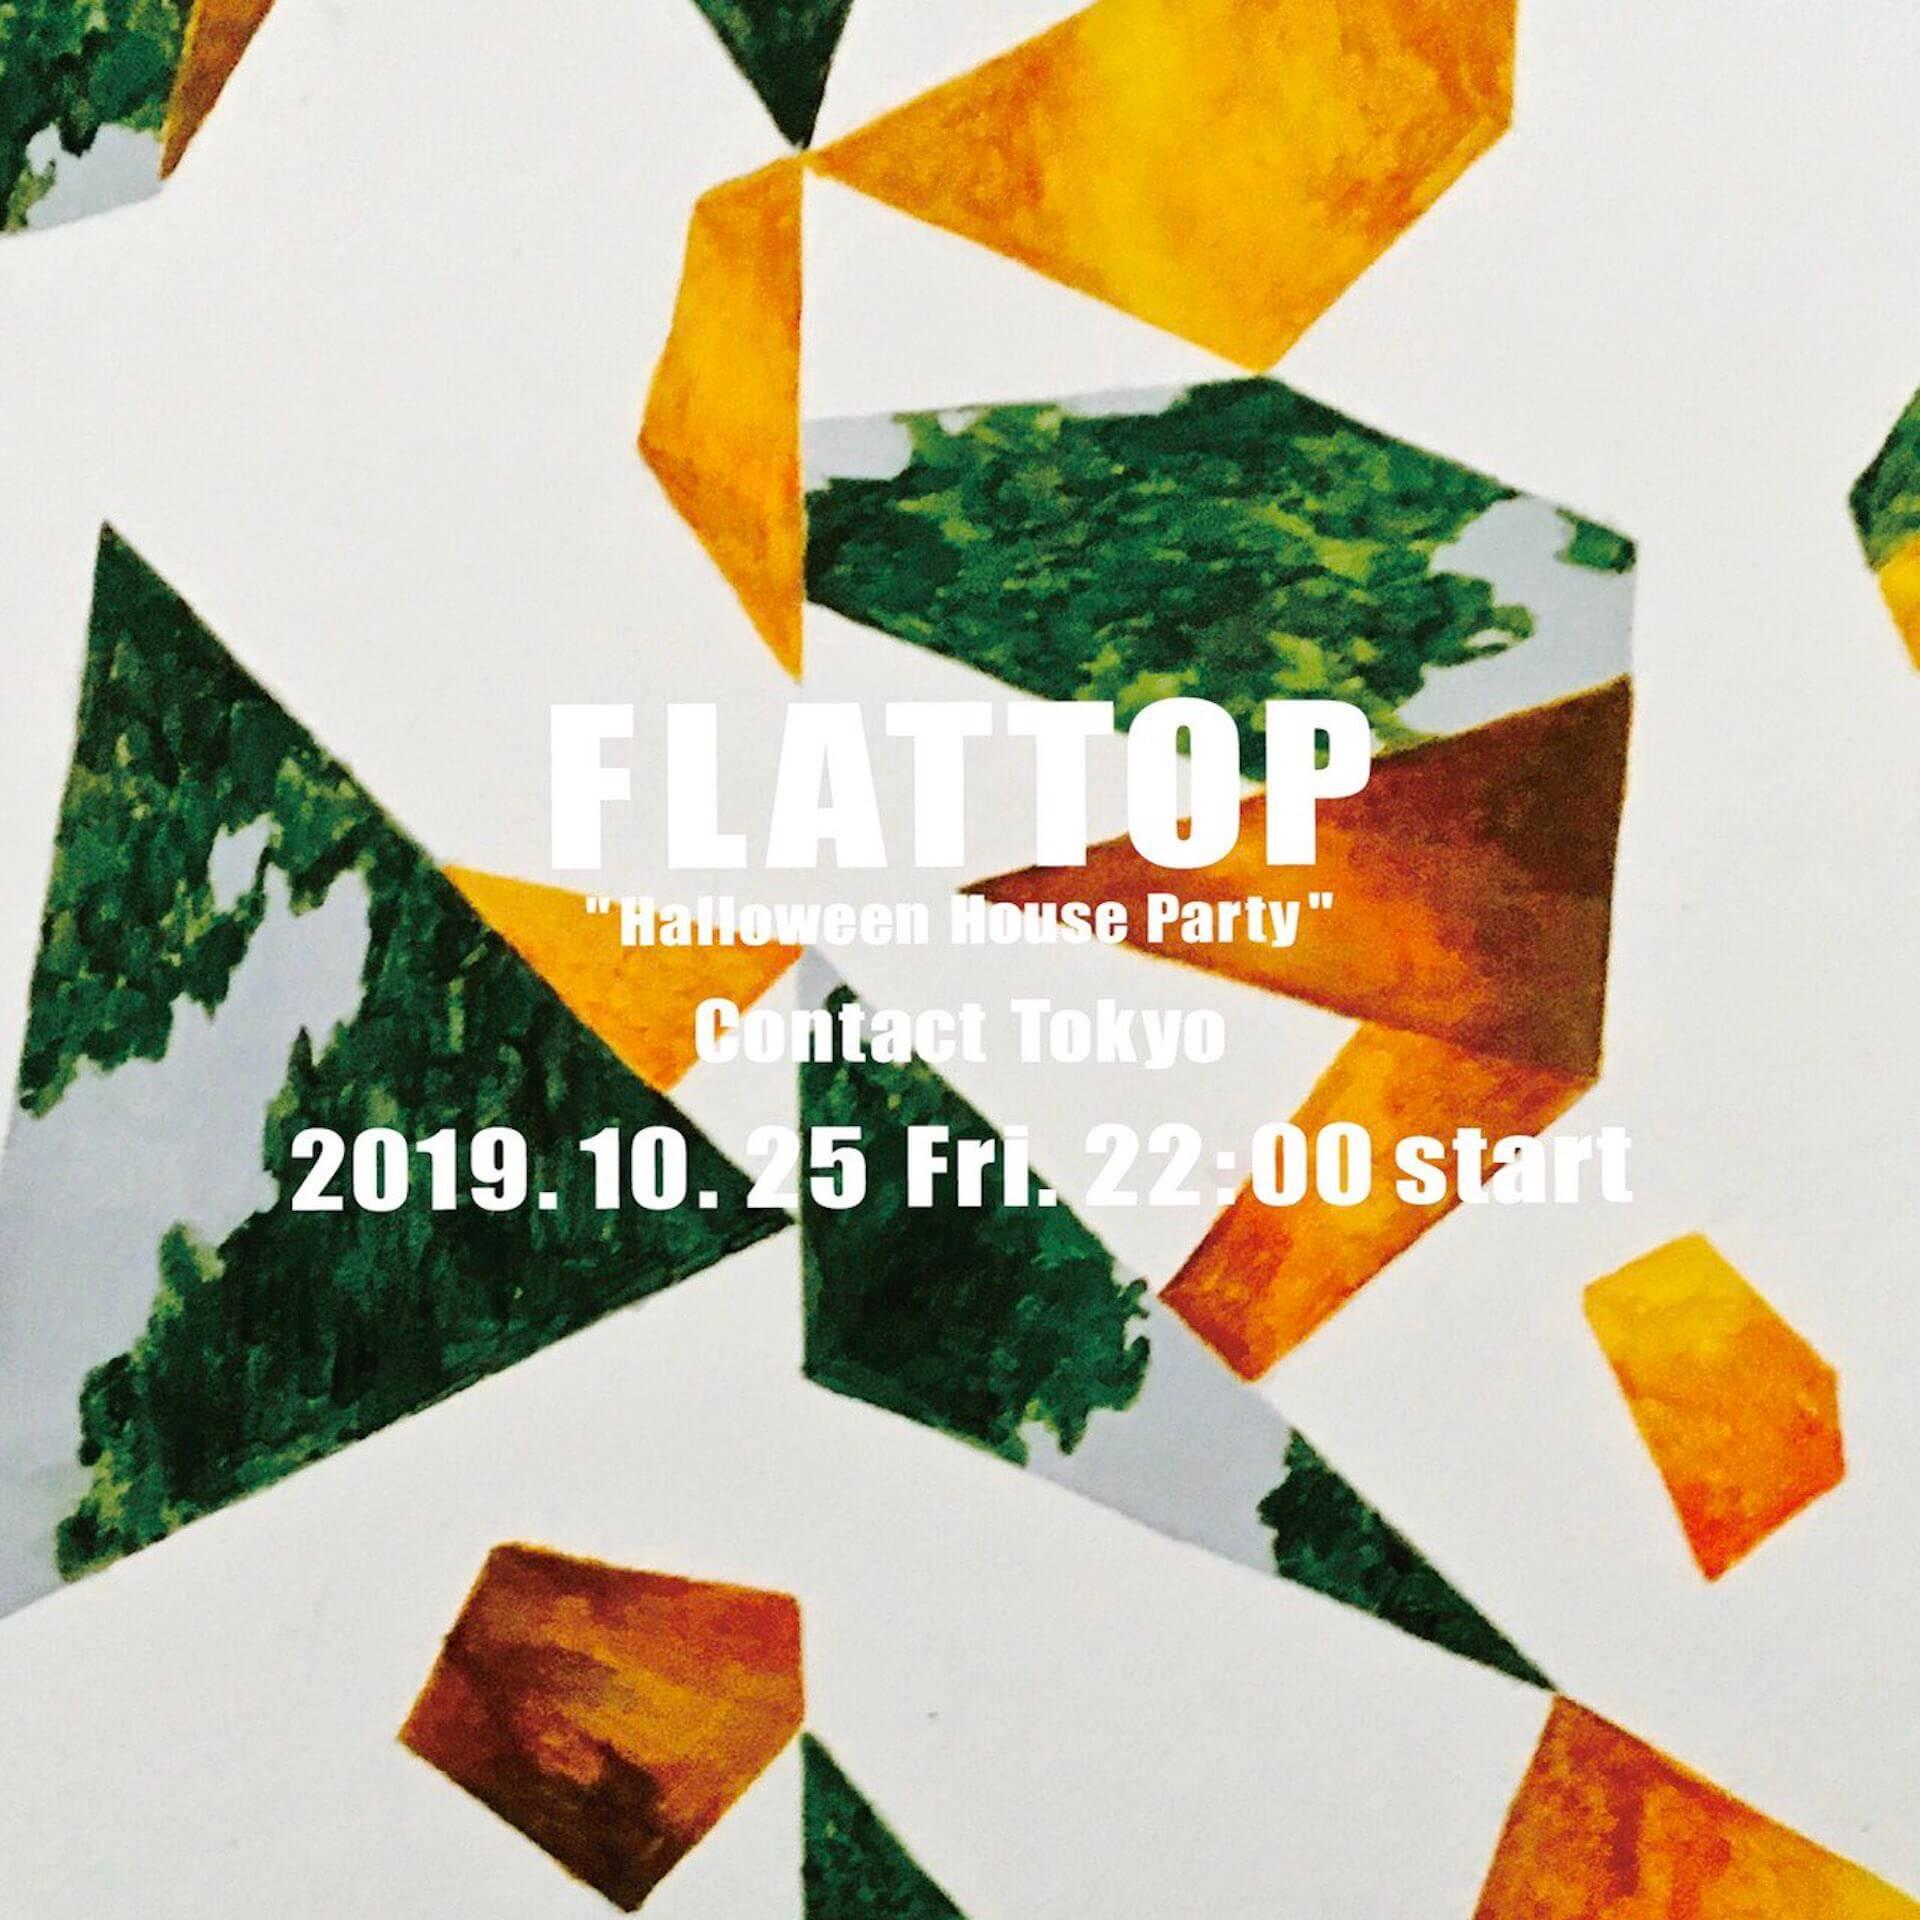 FLATTOPがハロウィン・ハウス・パーティーを開催 Shanti Celeste、Josey Rebelleを招聘、CHANGSIE、Mayurashka、CYKらが登場 music191024-flattop-2